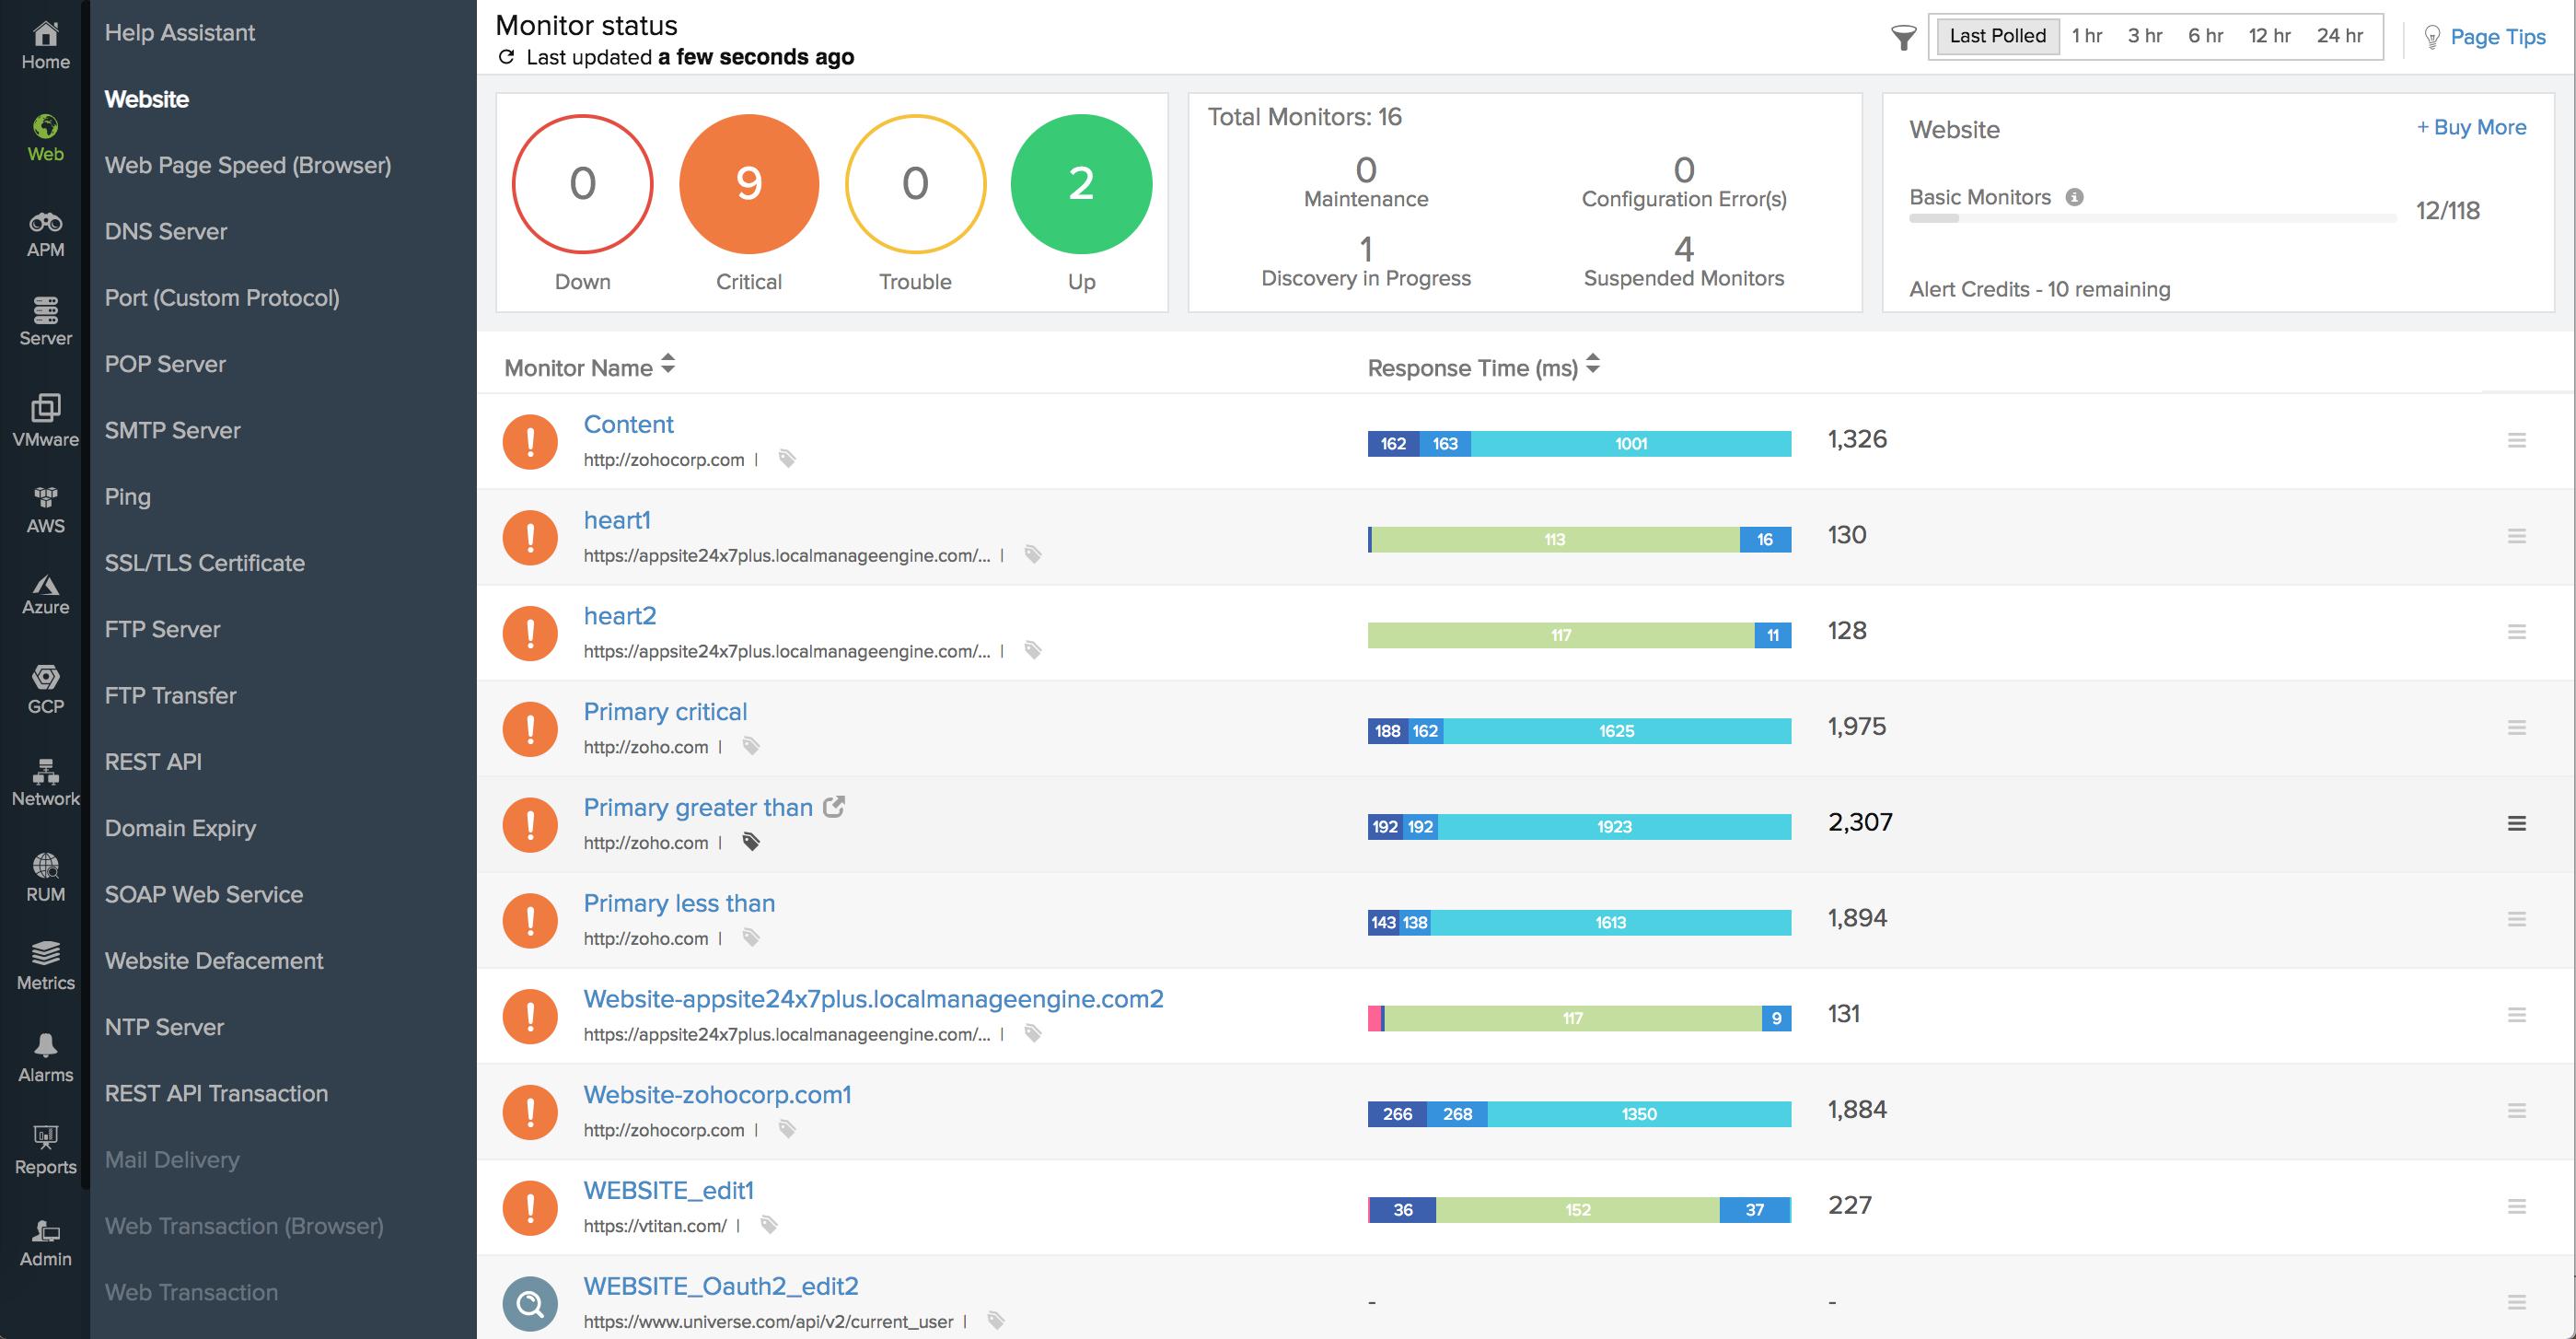 Online website monitoring